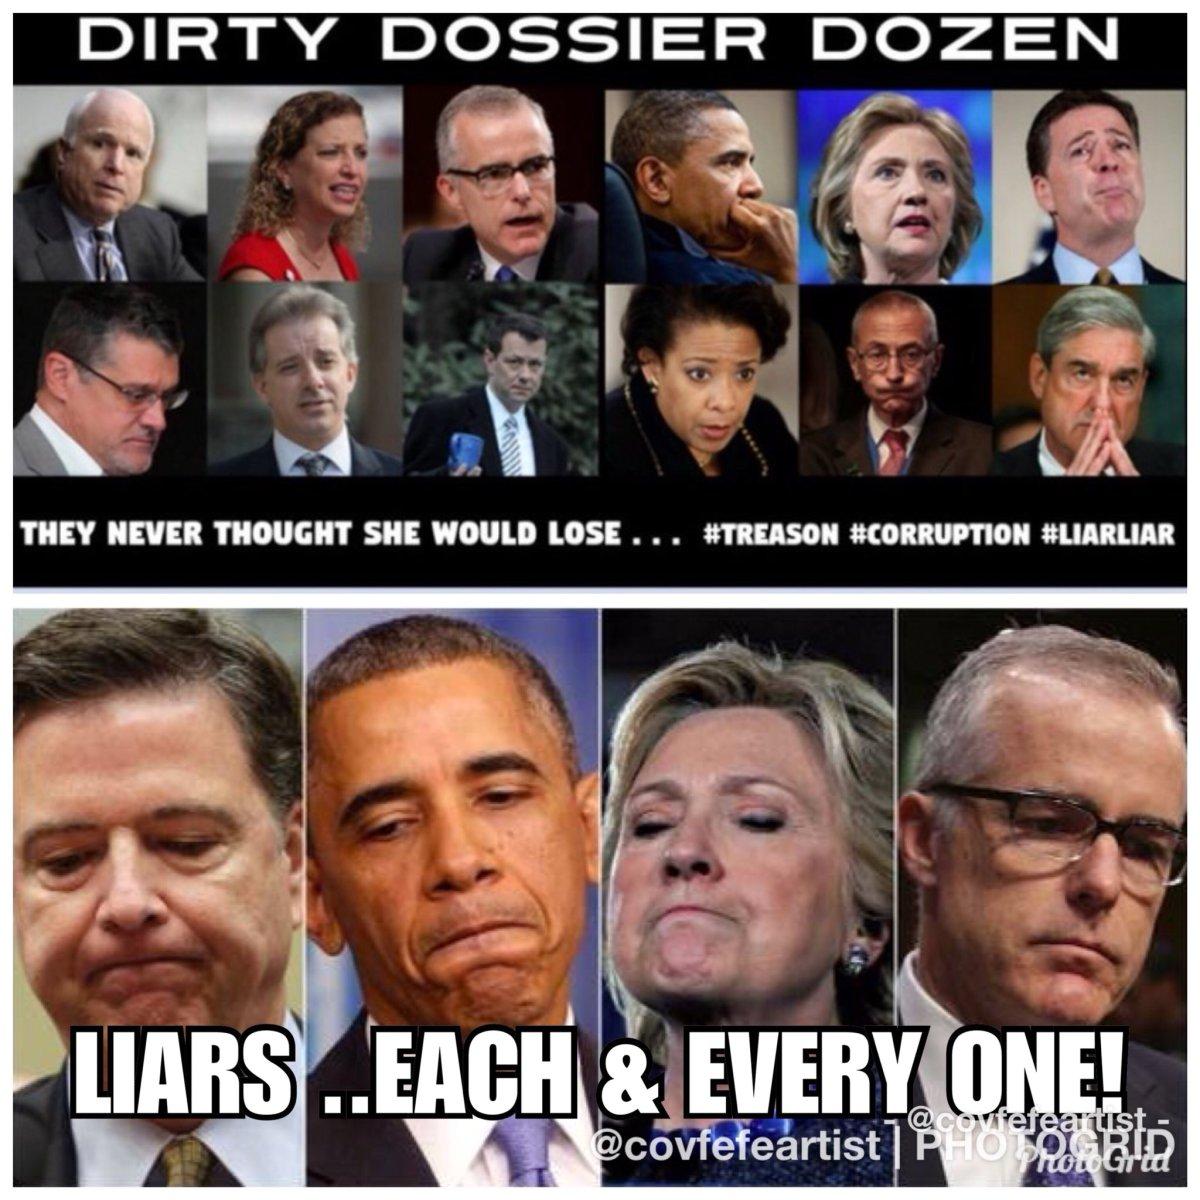 dirty dossier dozen